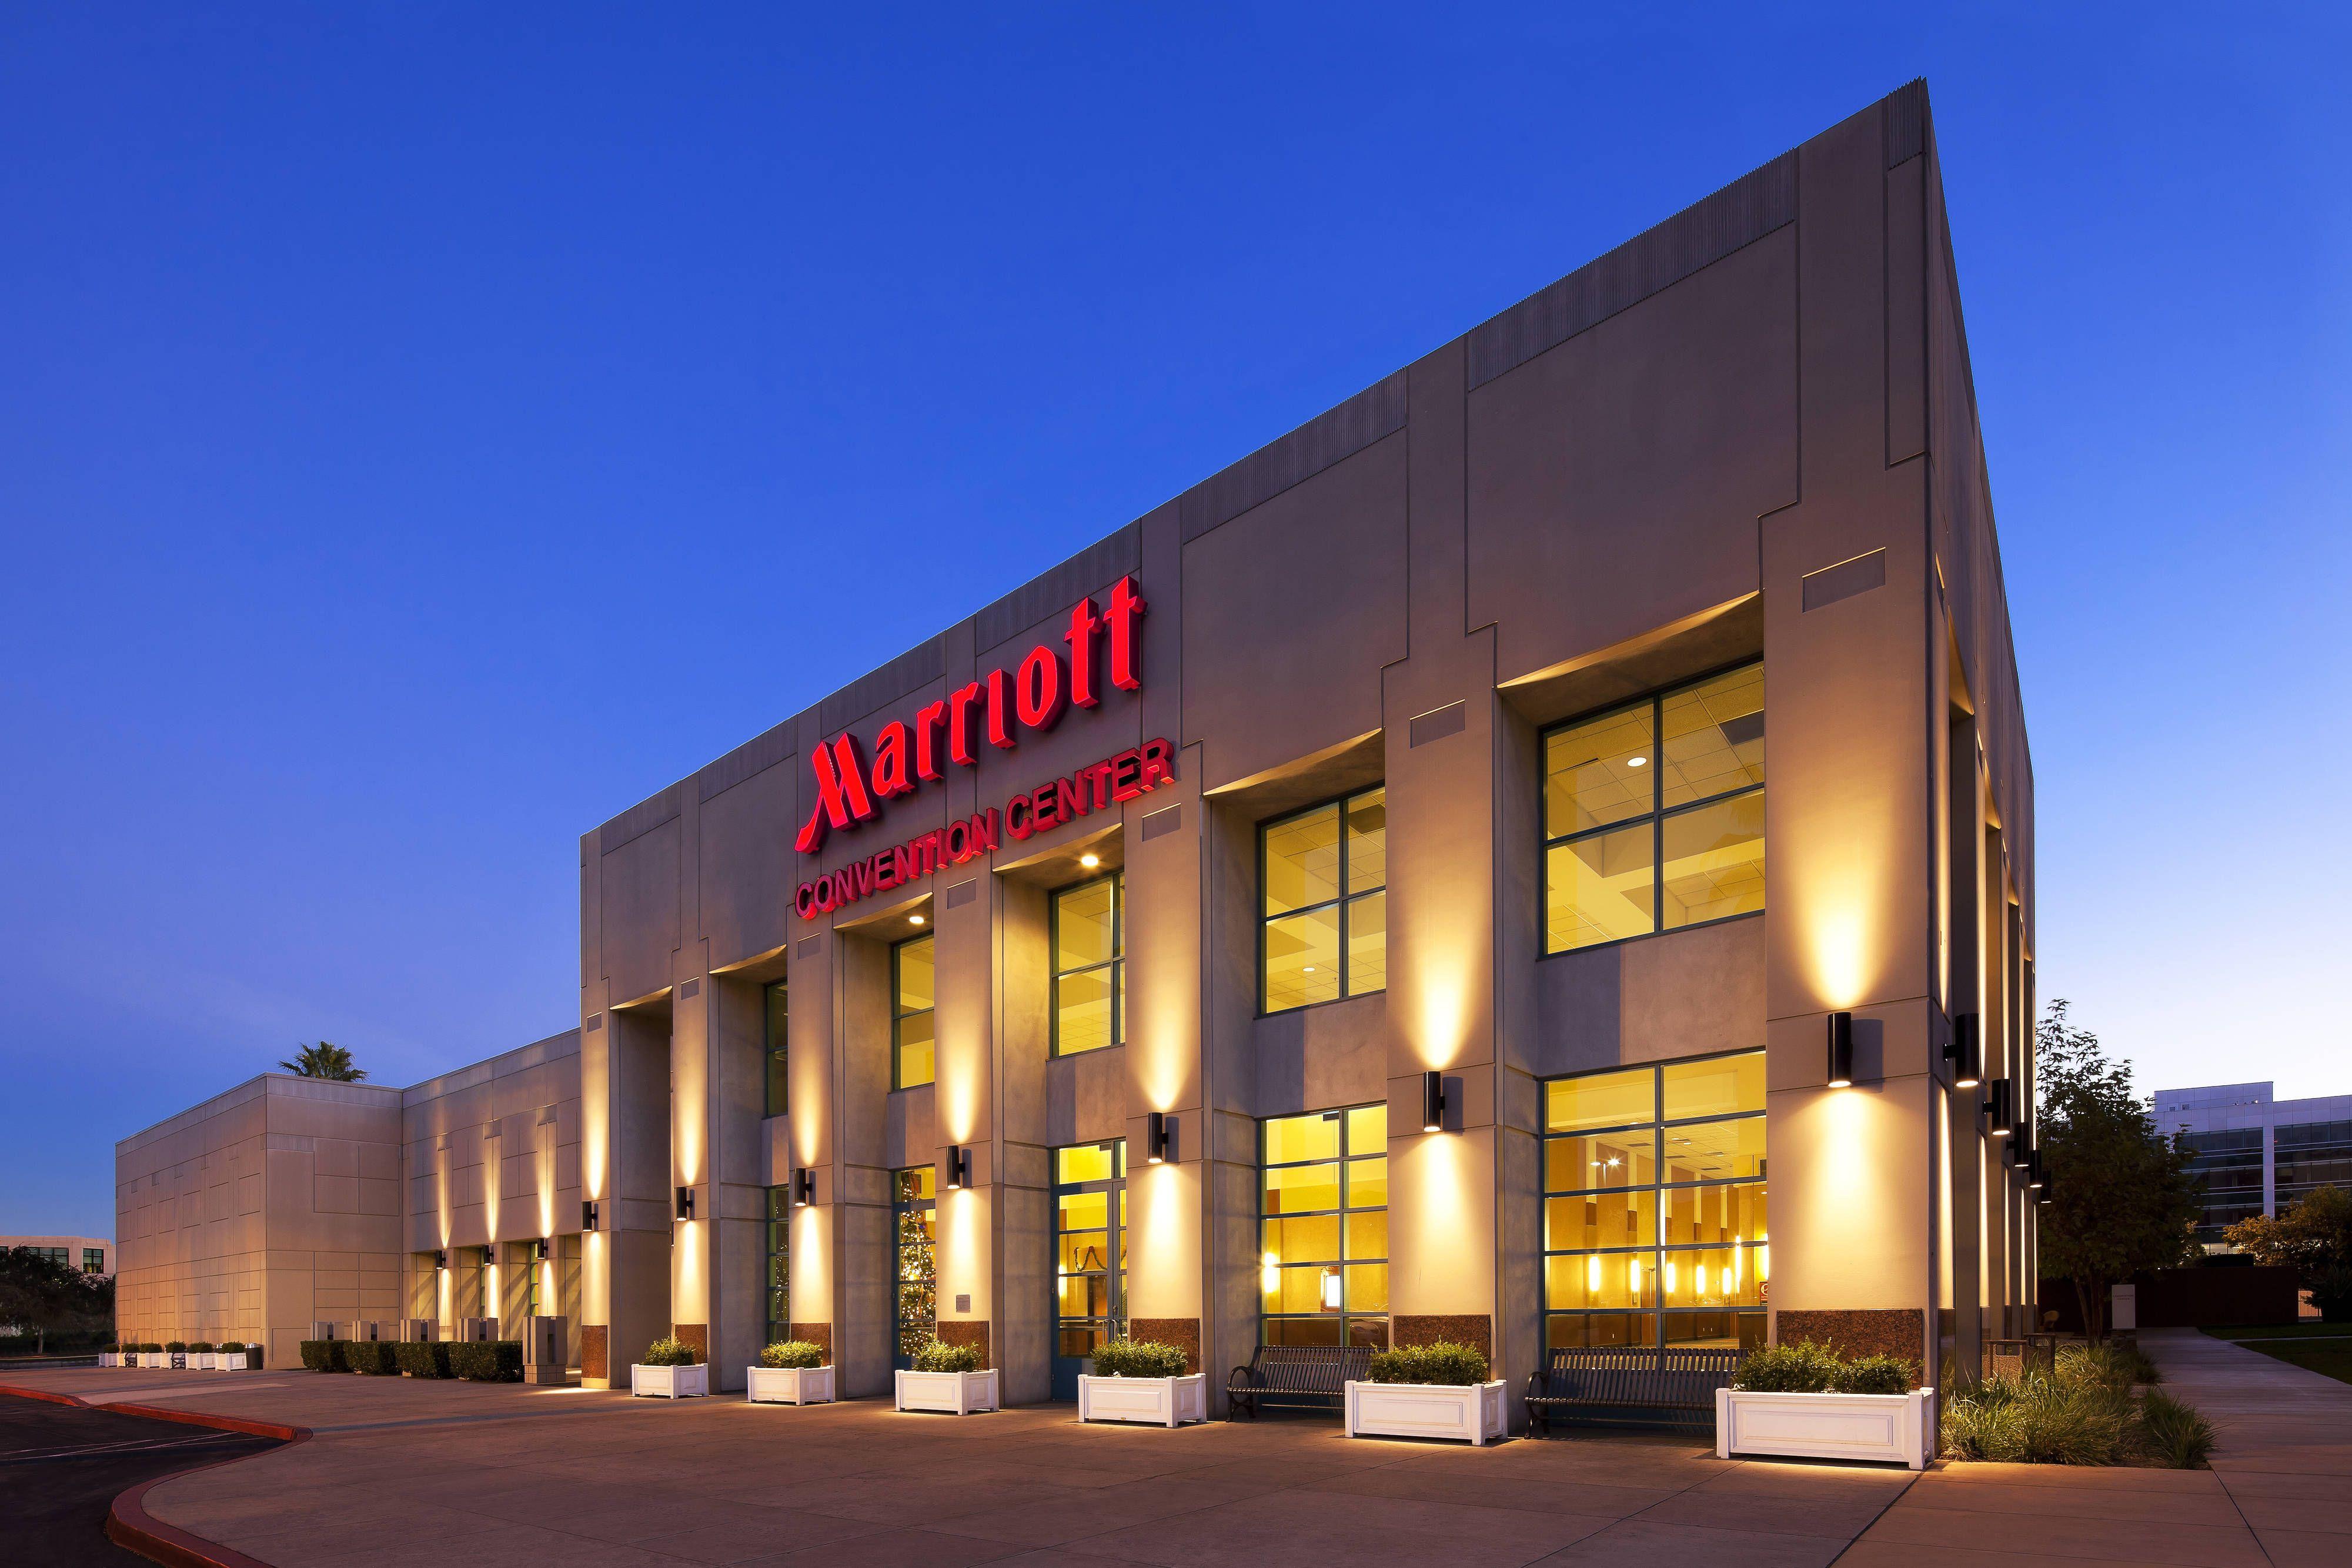 Los Angeles Marriott Burbank Airport Convention Center Enjoying Hotels Rooms Burbank Hotels California Hotel Burbank